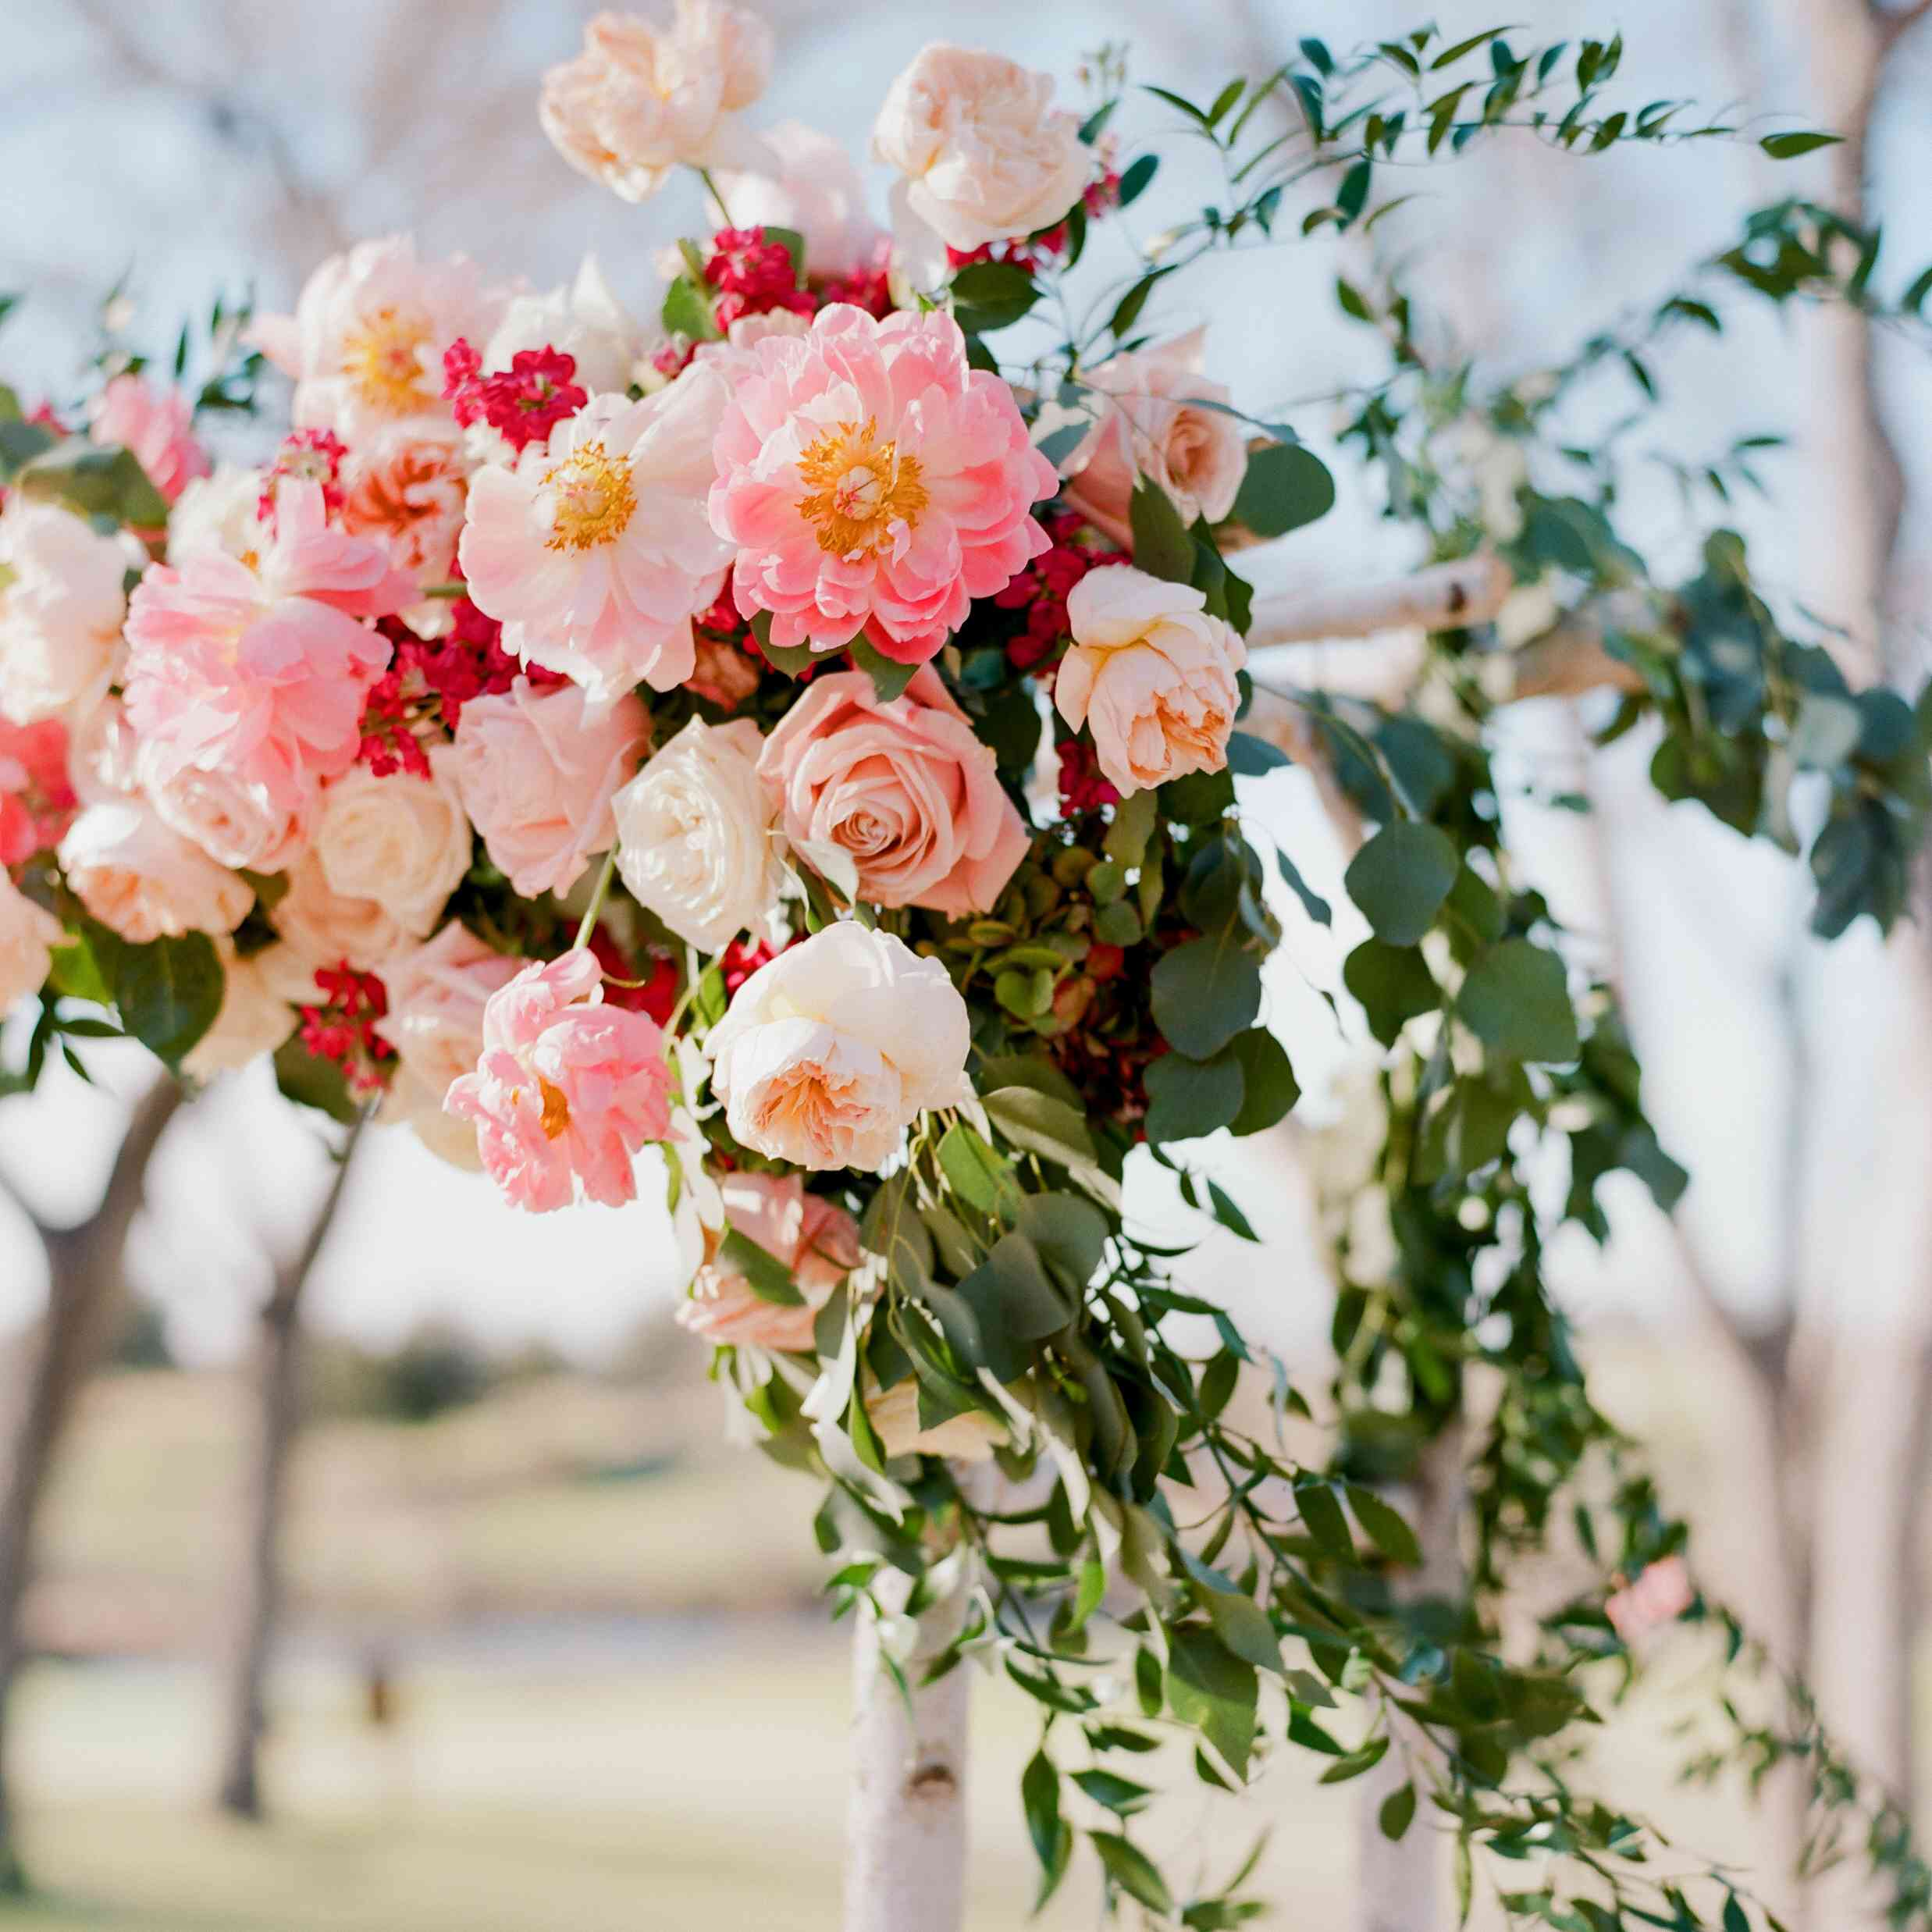 <p>flowers</p><br><br>